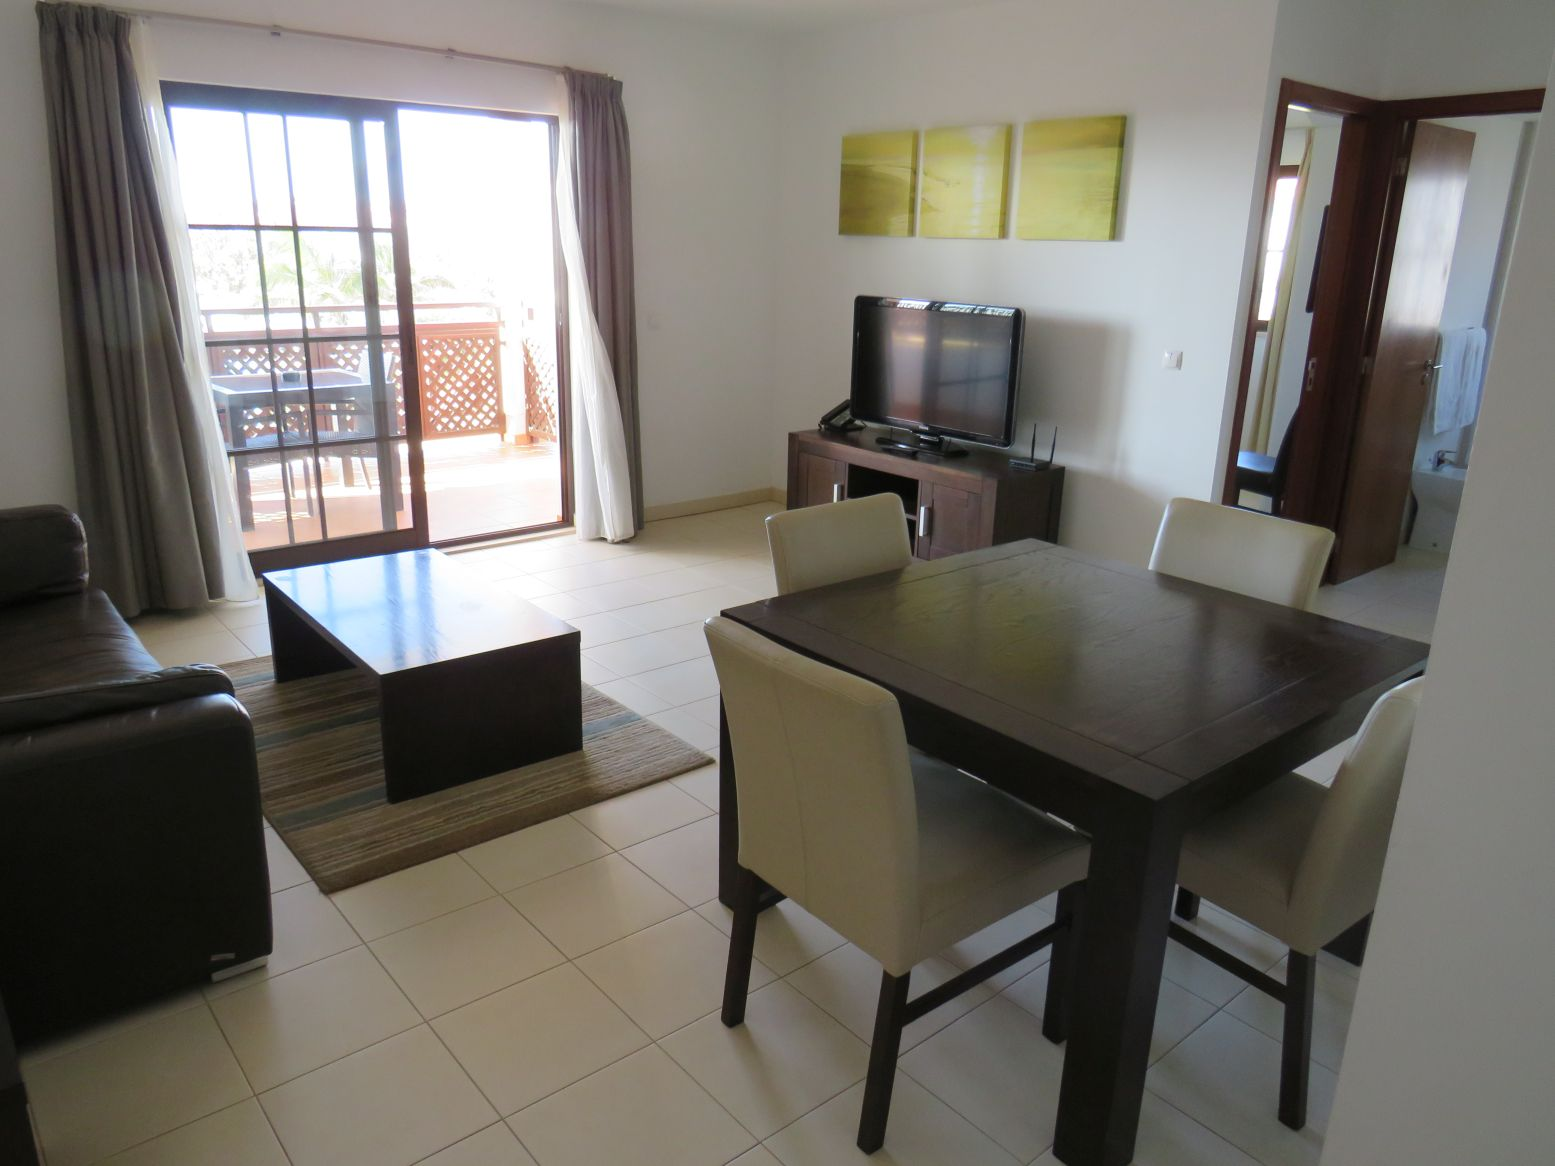 Tortuga Beach resort Cape Verde Property for sale living room